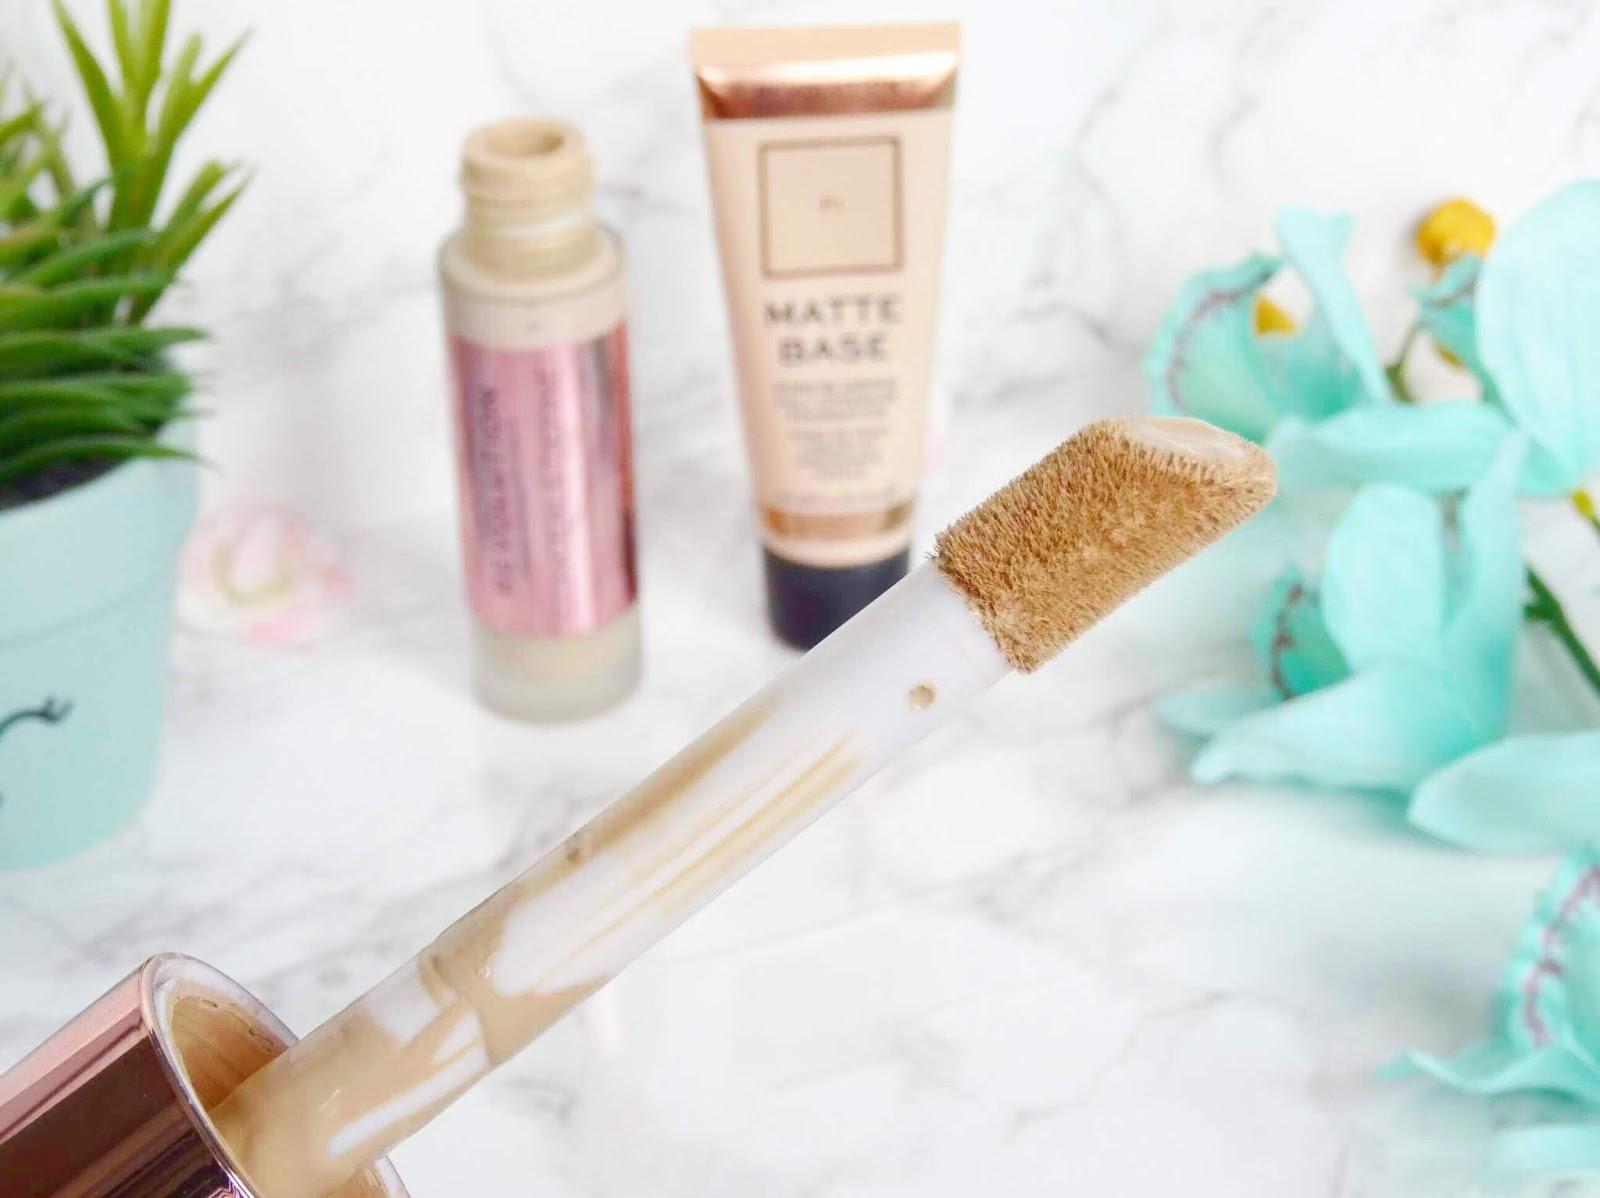 Makeup Revolution Conceal and Define Foundation Doe-Foot Applicator